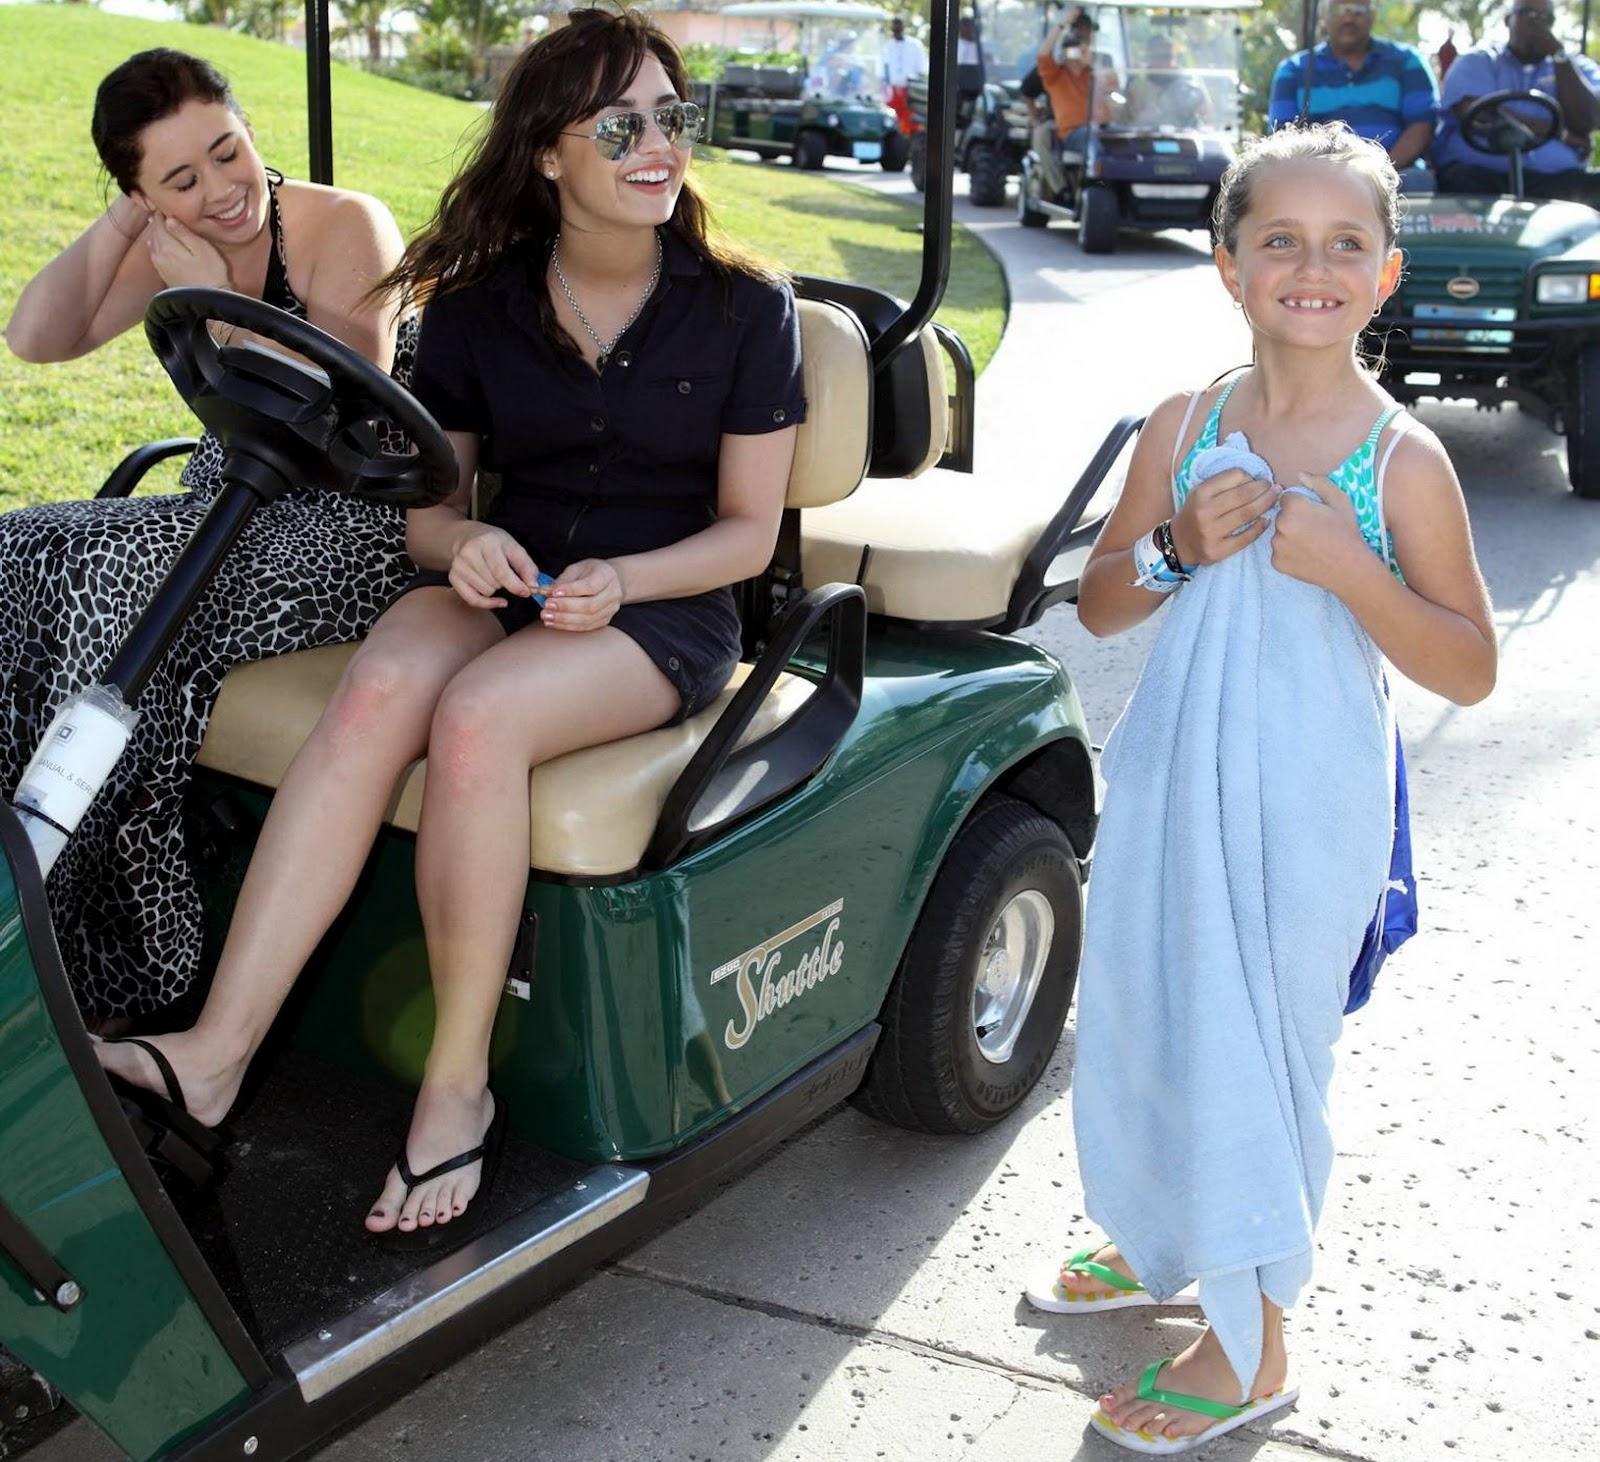 http://2.bp.blogspot.com/-iJ-n5KbodNM/UAjn_vra_0I/AAAAAAAACTo/-wy3t5dr_sU/s1600/Demi-Lovato-Feet-66936.jpg